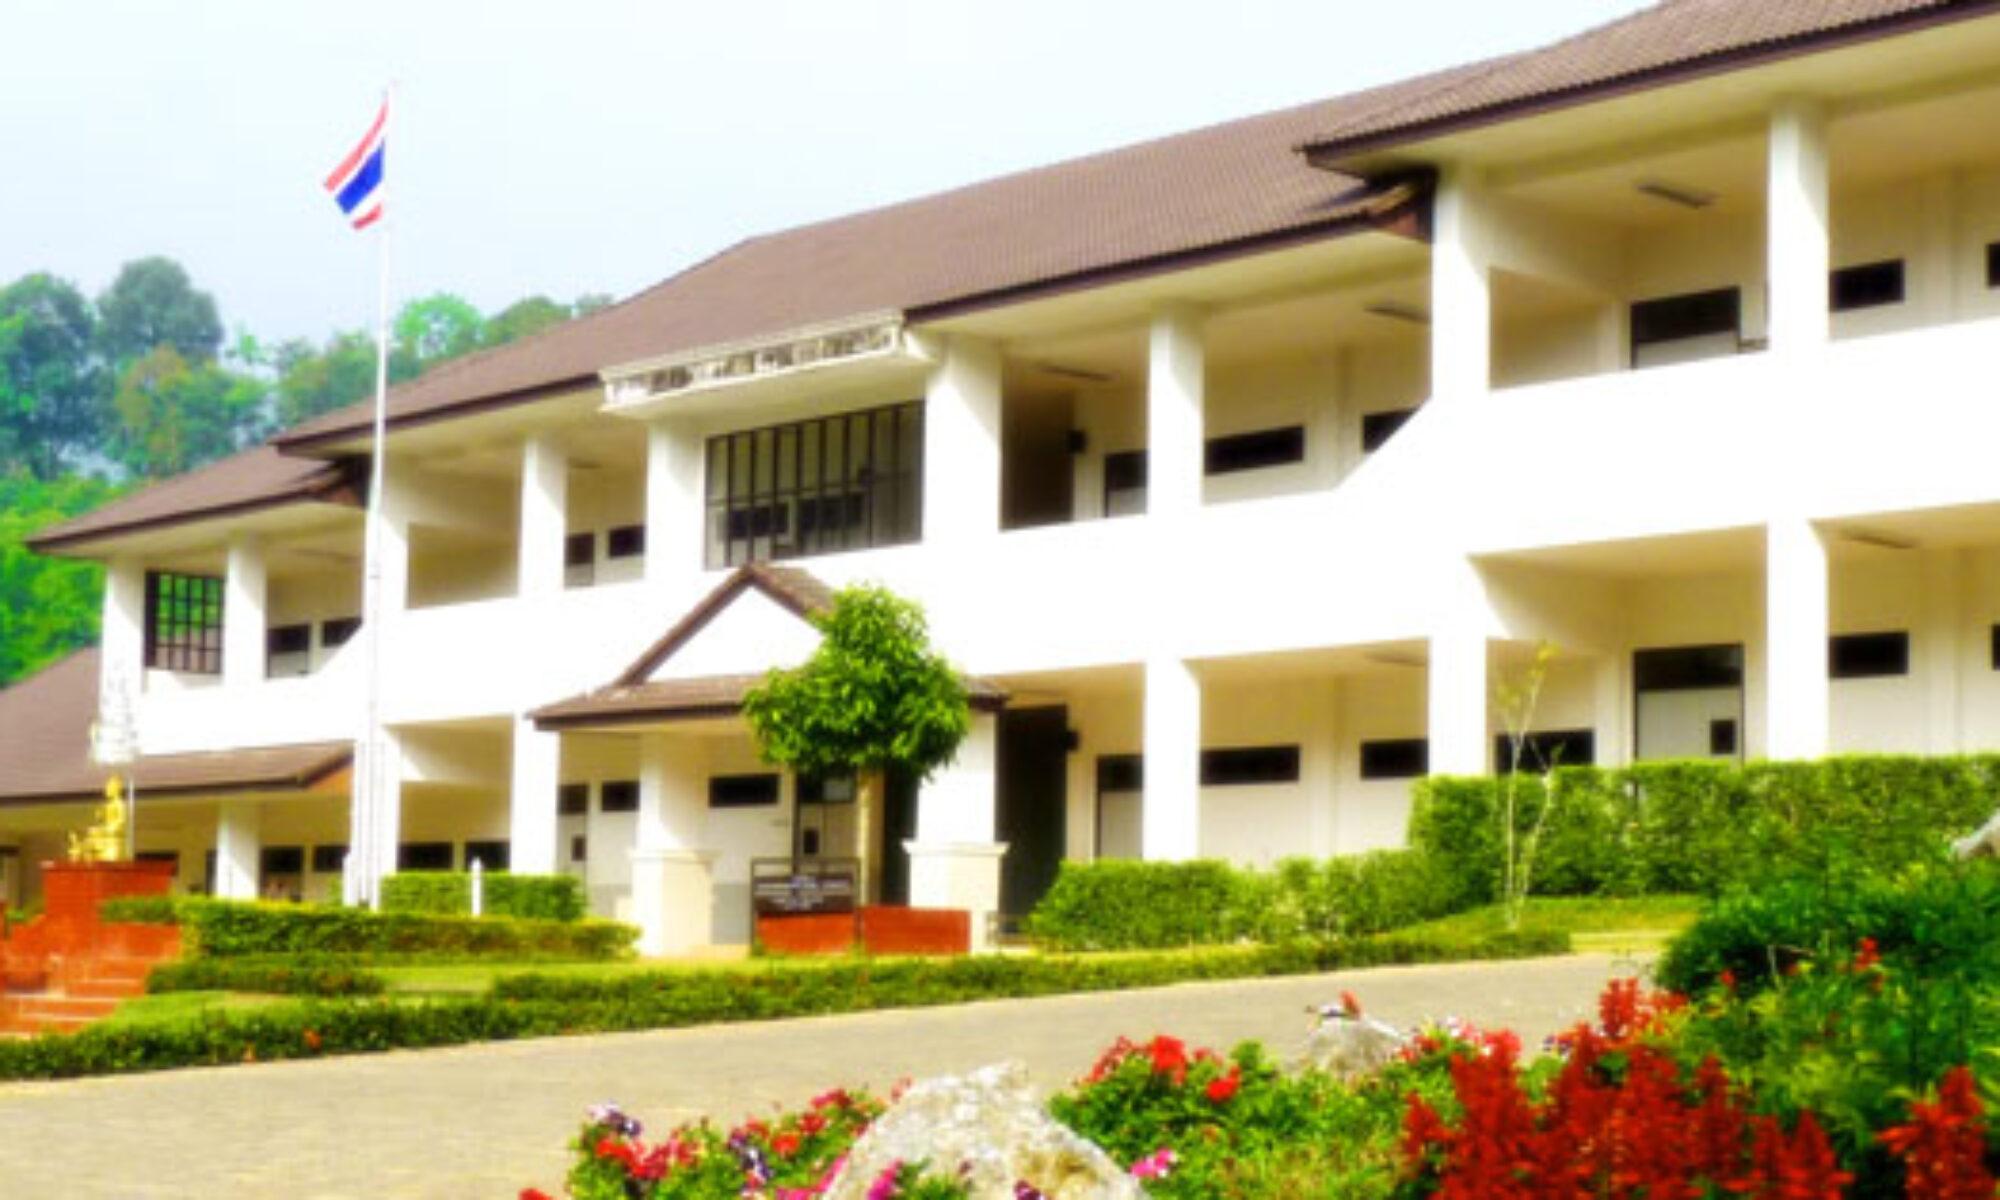 Ban Huairaisamakkee School